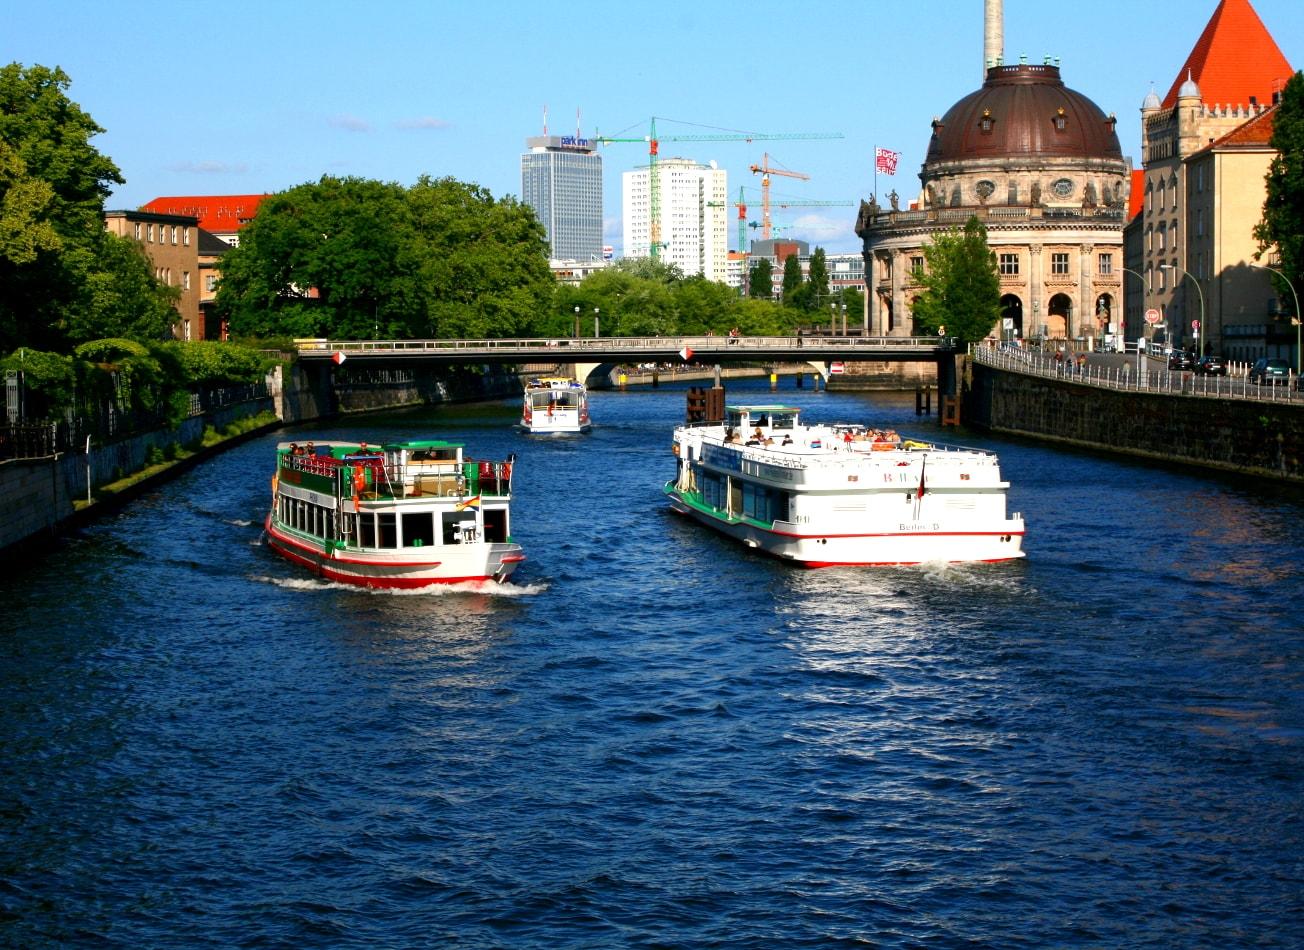 croisière apéritif sur la rivière spree berlin activites vimigo